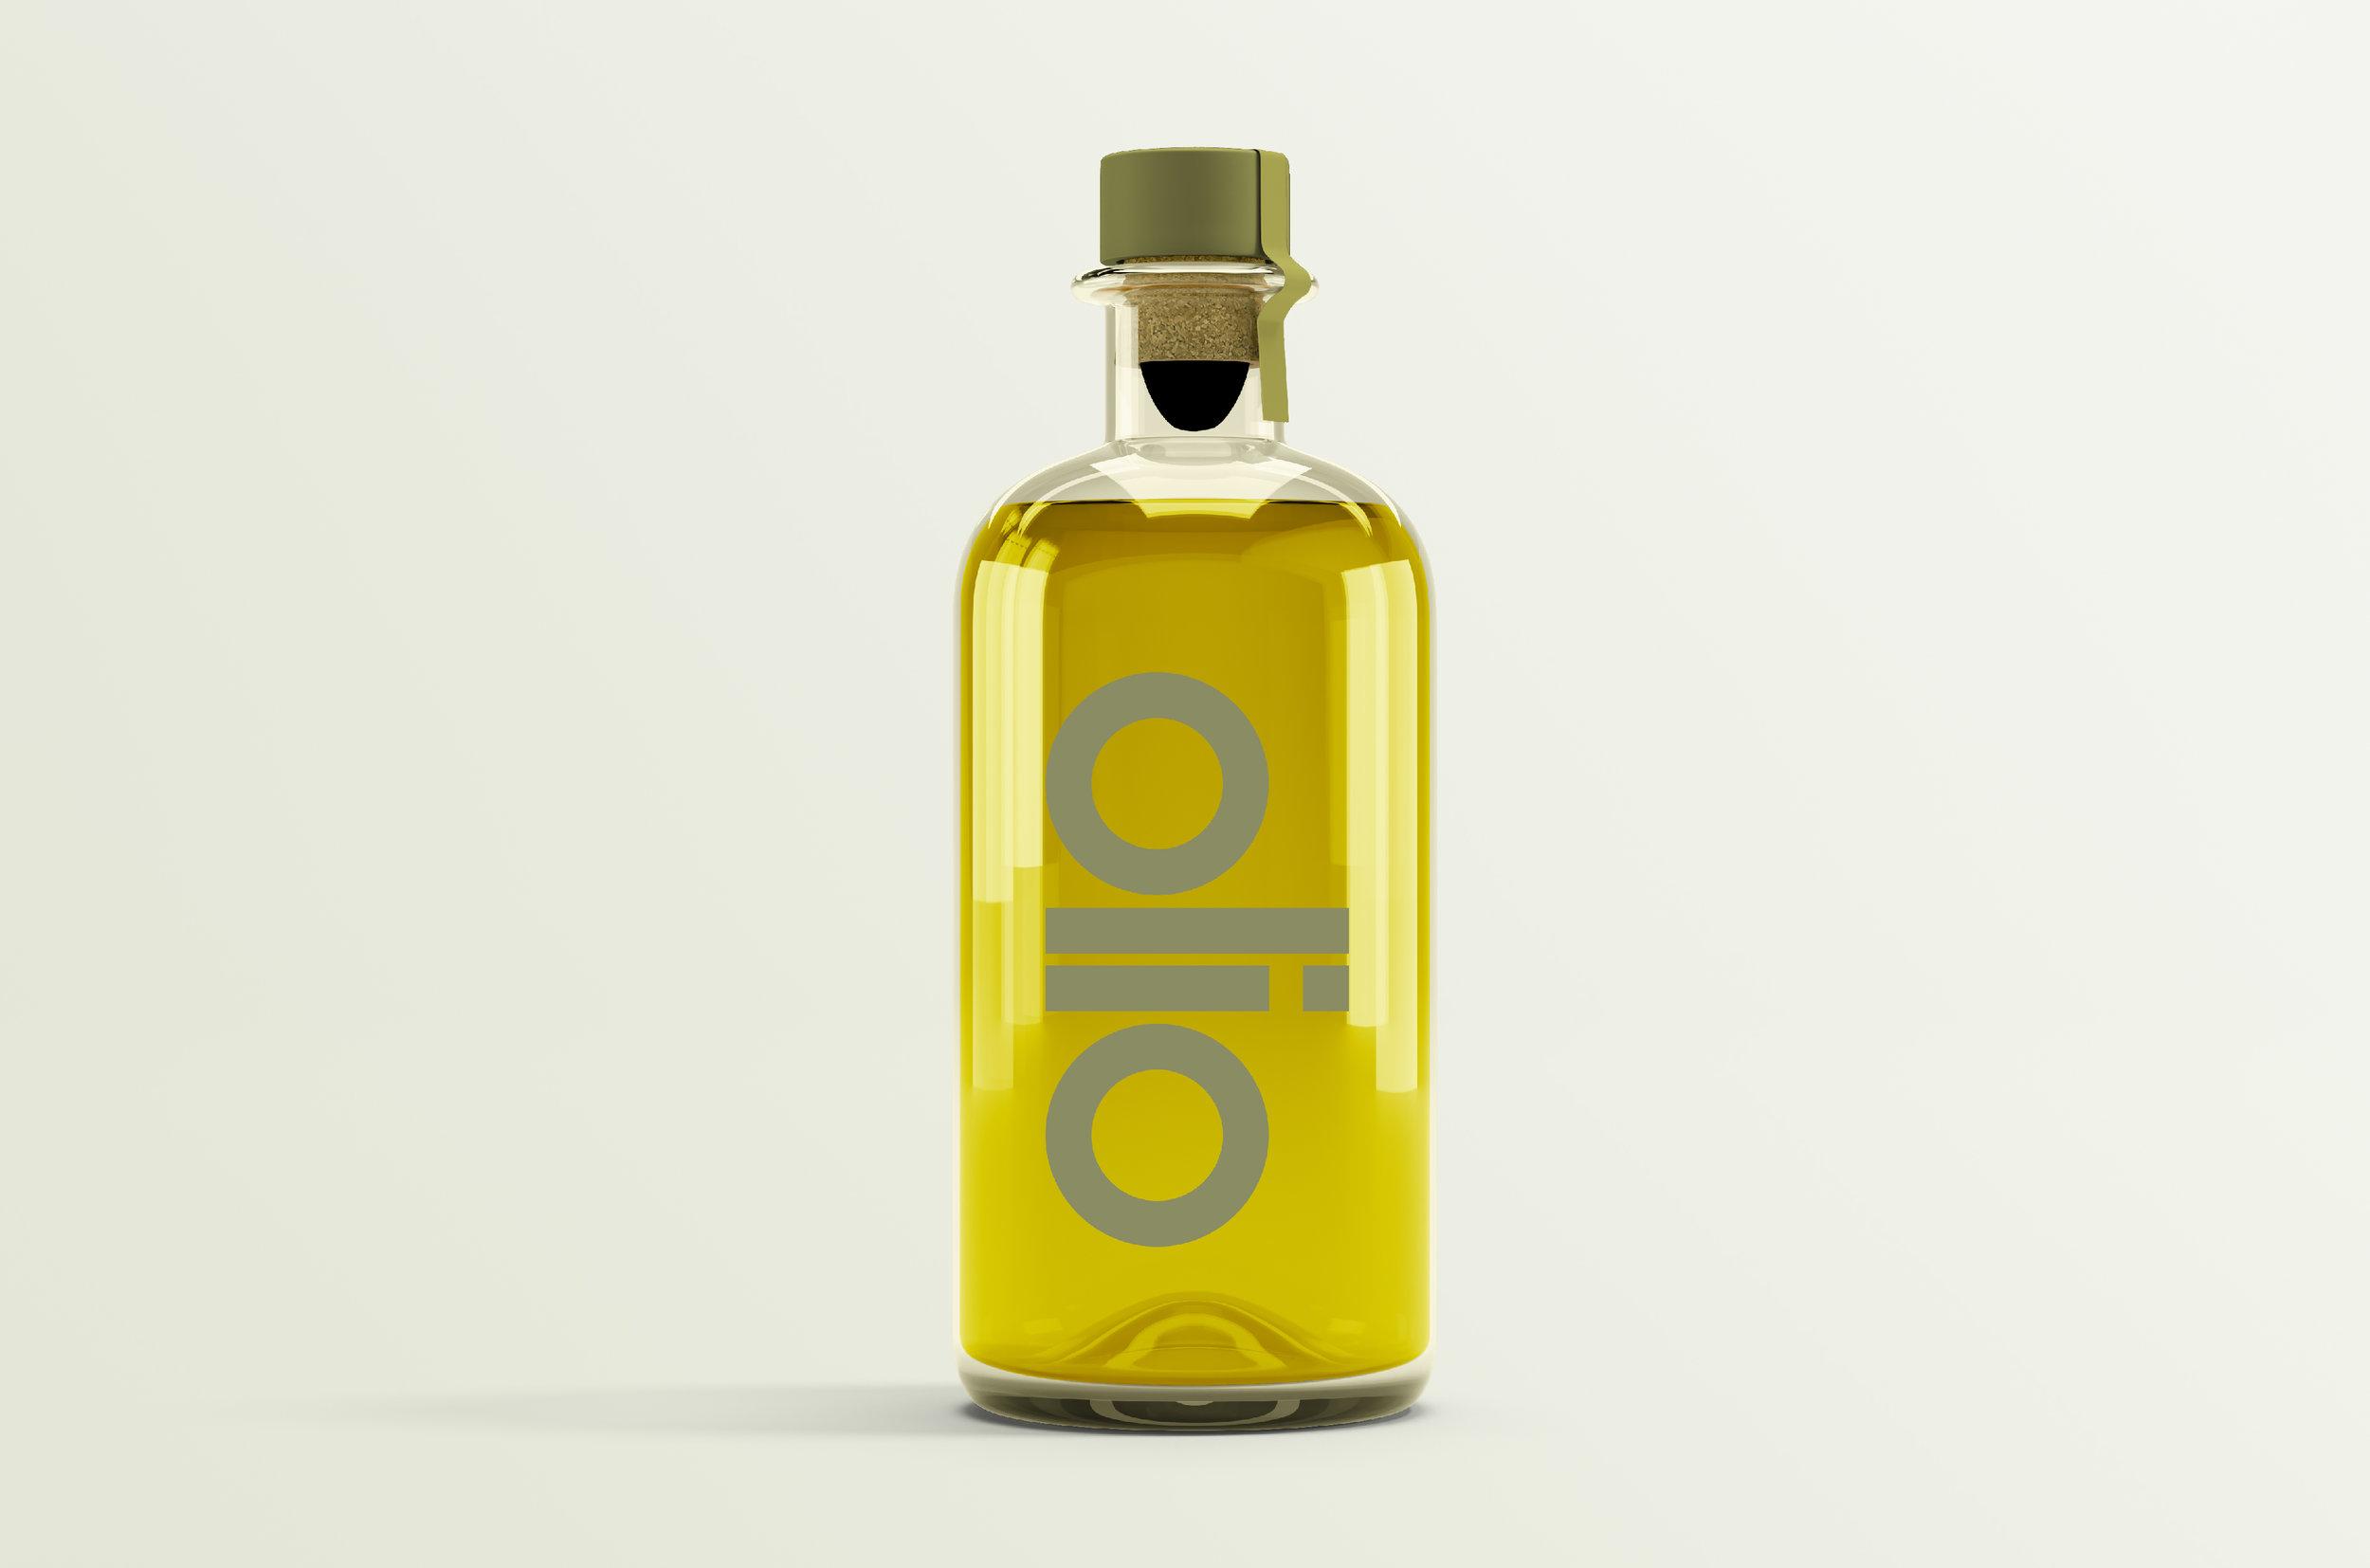 Olio_Logo-06.jpg